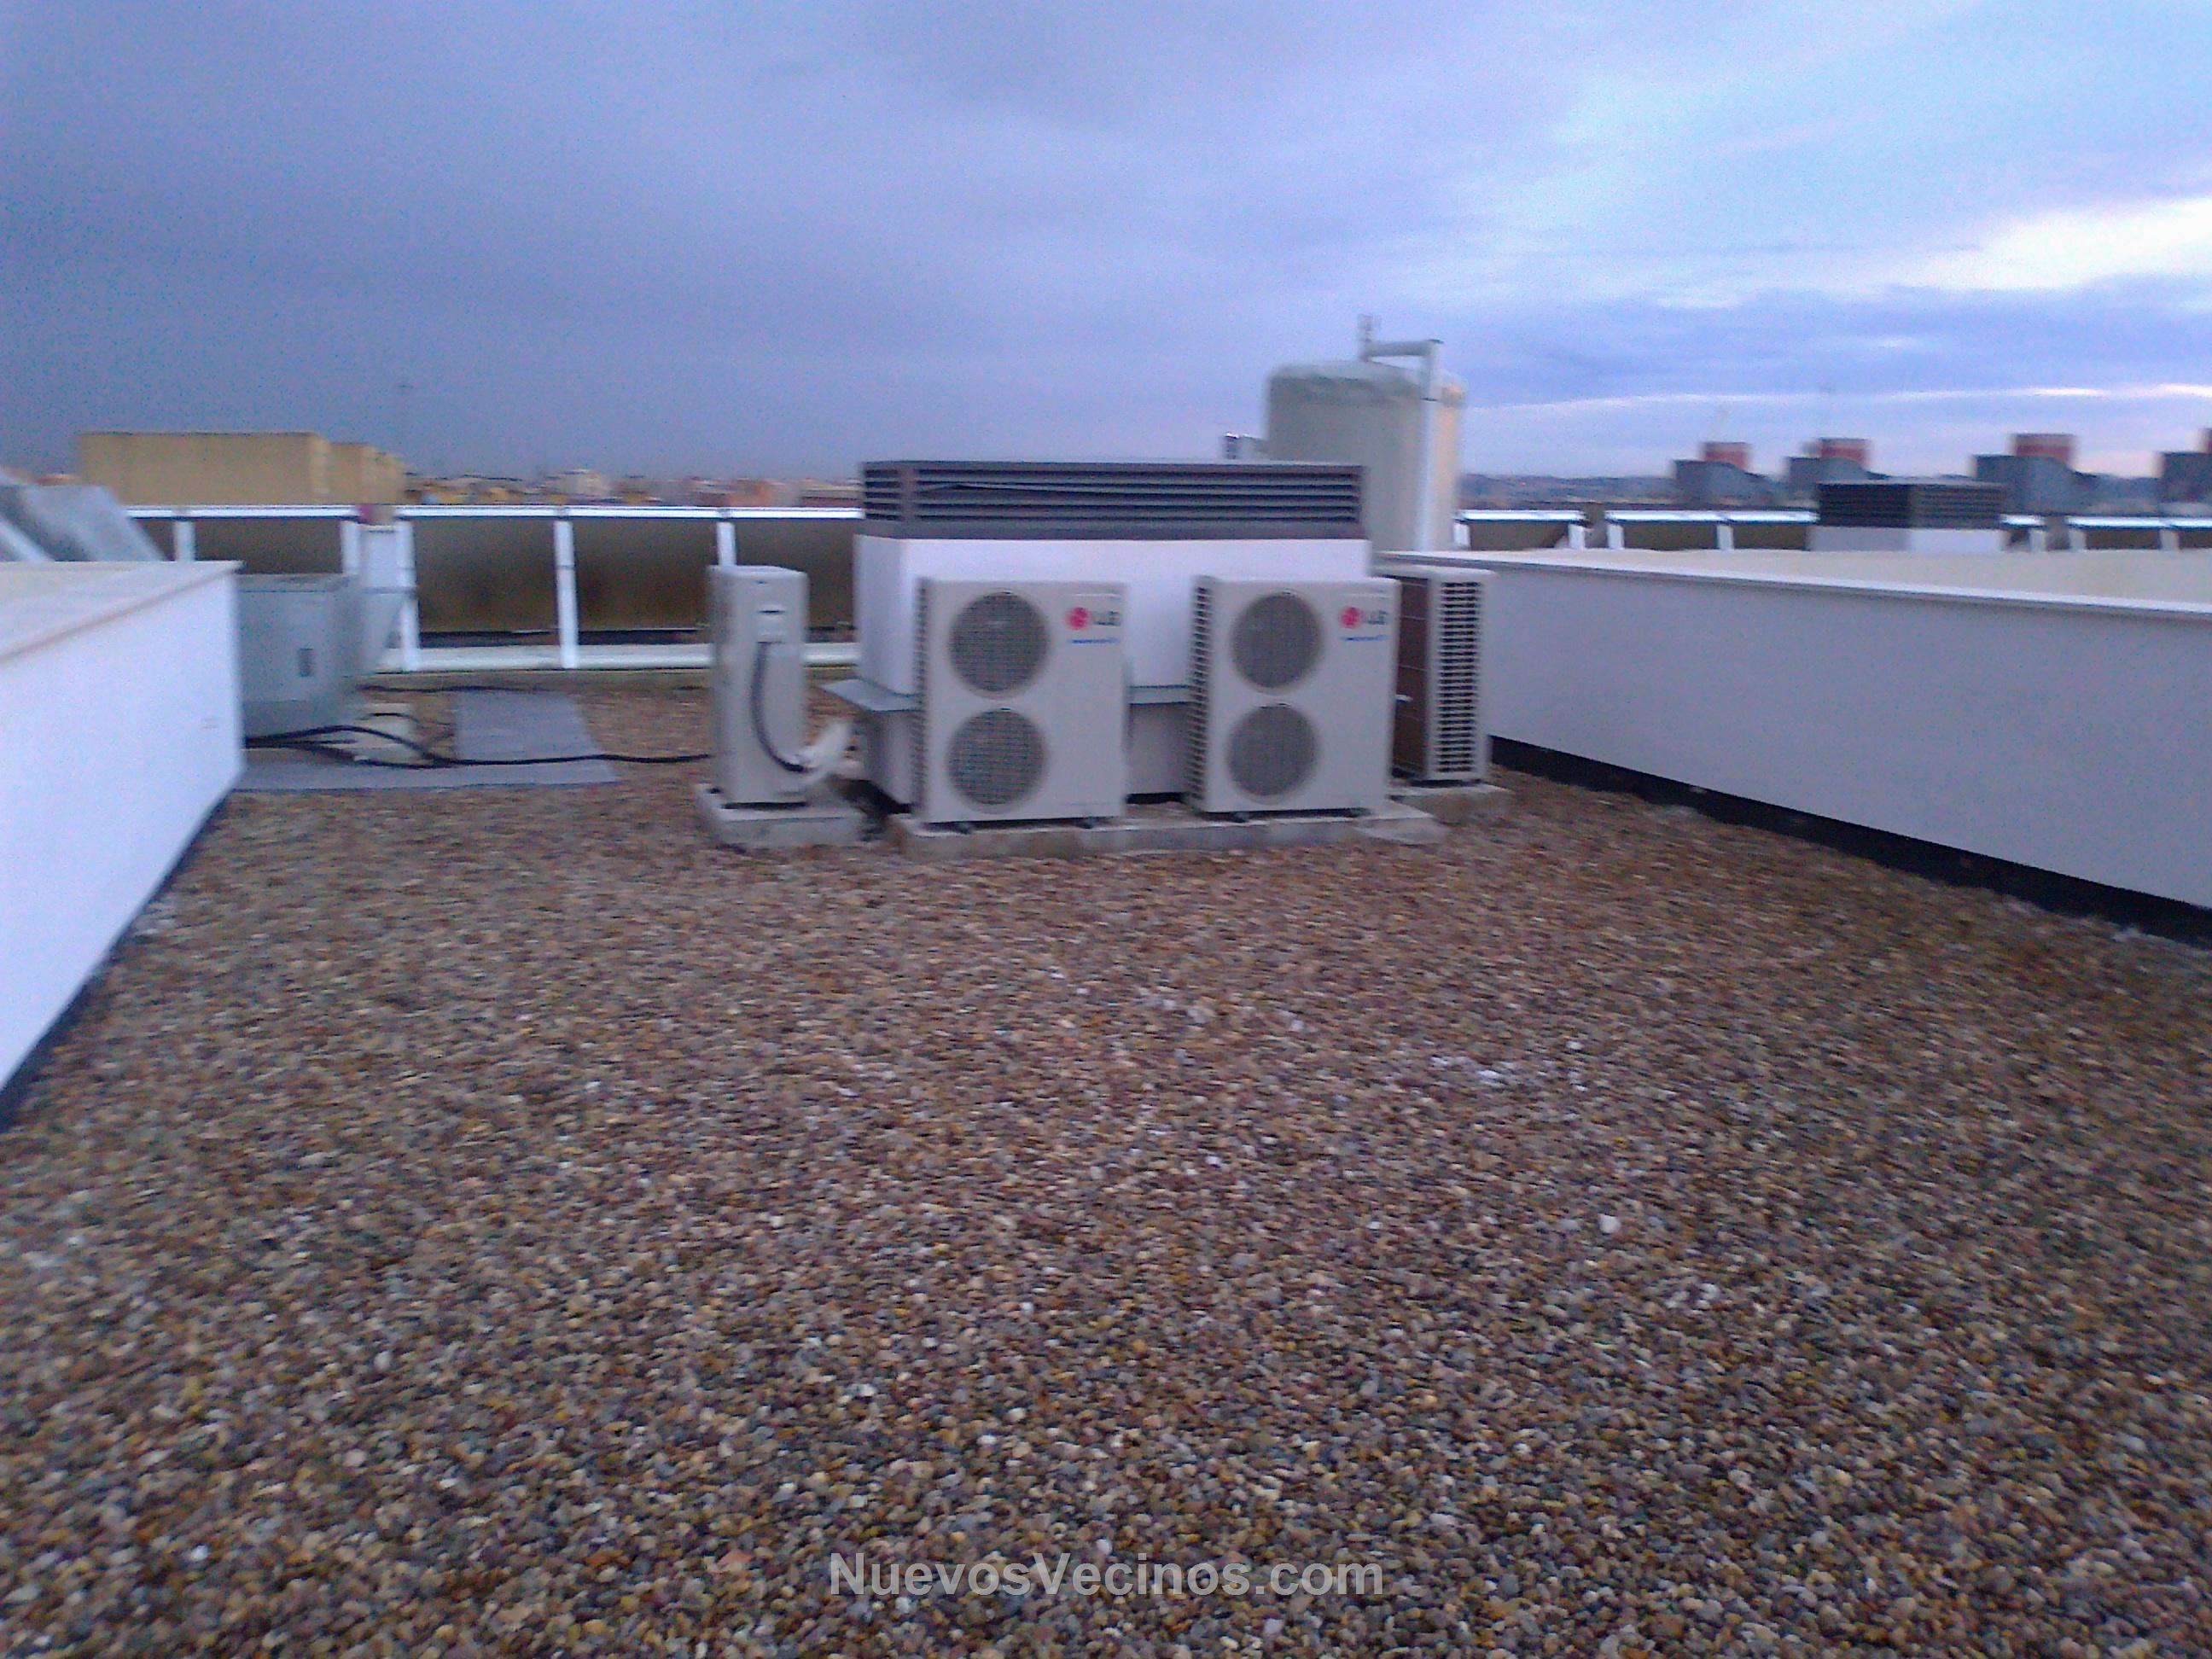 Residencial entrestrellas fotos m quinas aire for Maquinas de aire acondicionado baratas